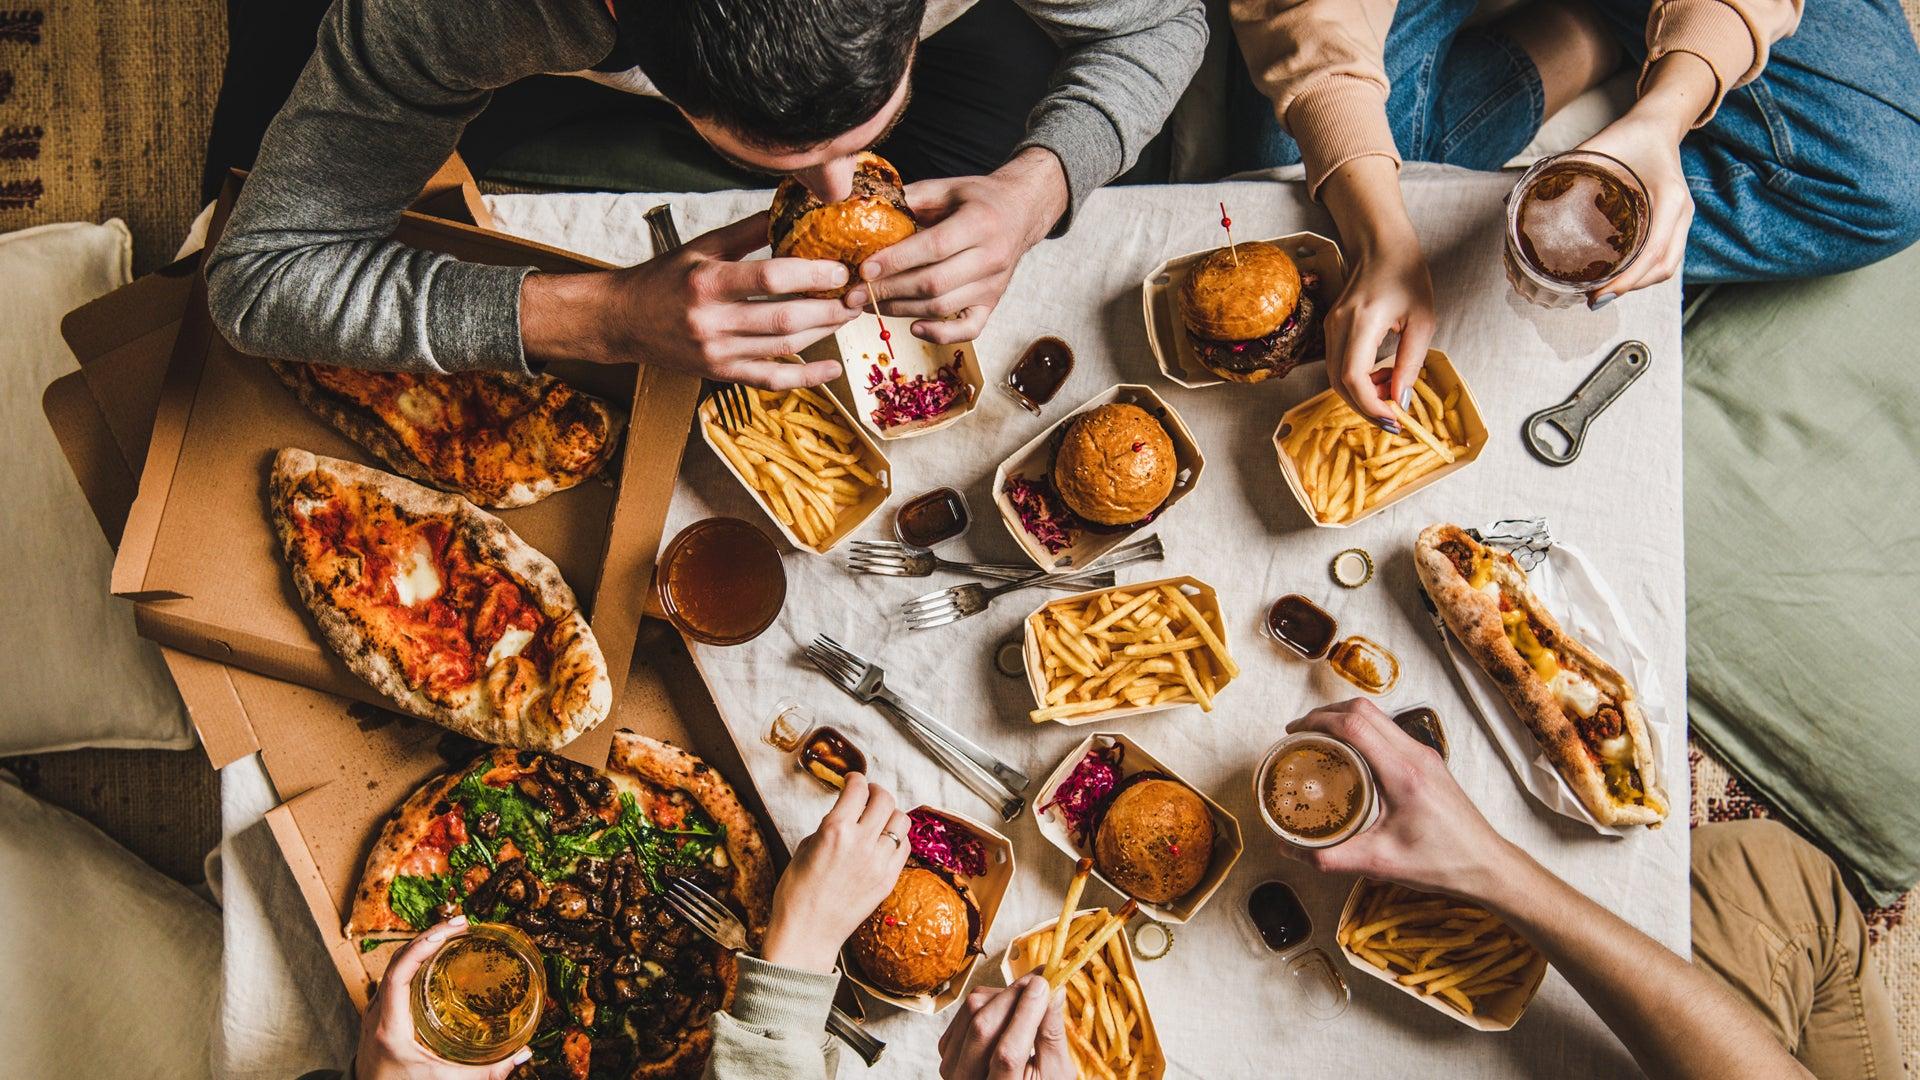 takeaway-food-drink-pizza-burger.jpeg